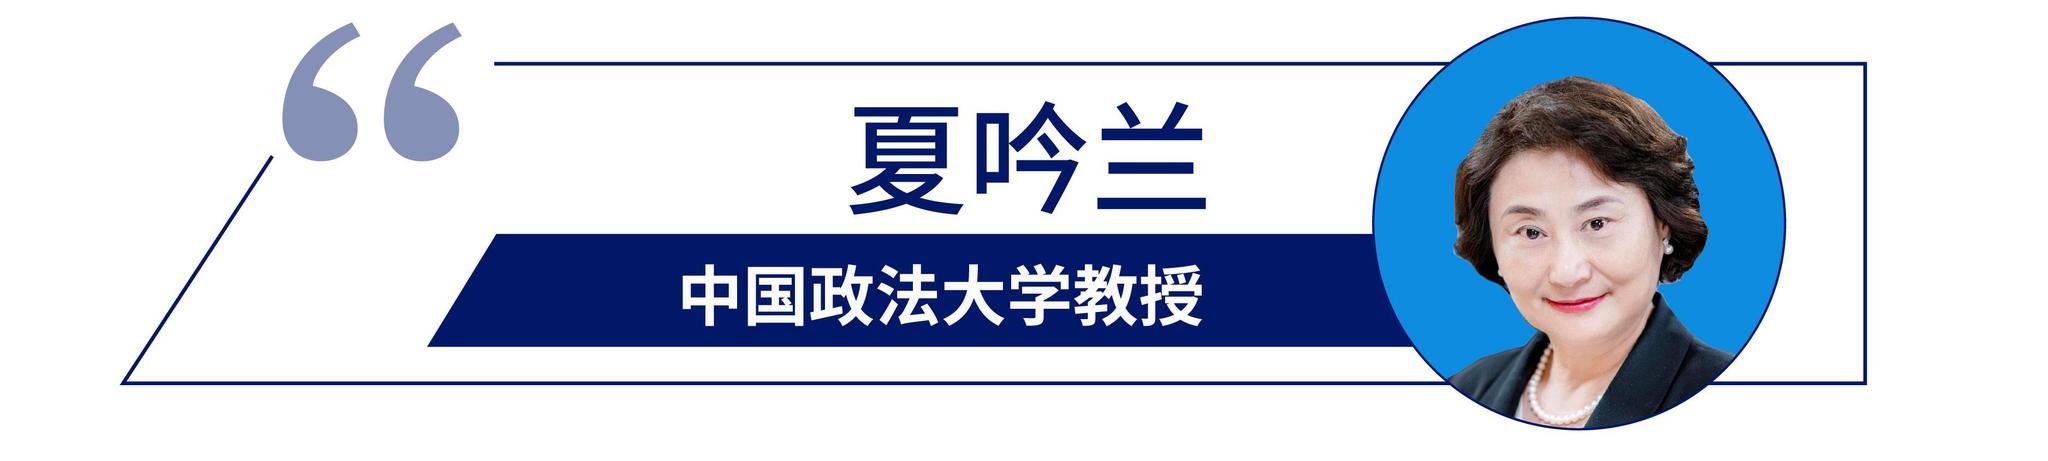 mg电子游艺app下载送彩金·枪支线索引出贩毒网络 千里追踪山城擒毒枭